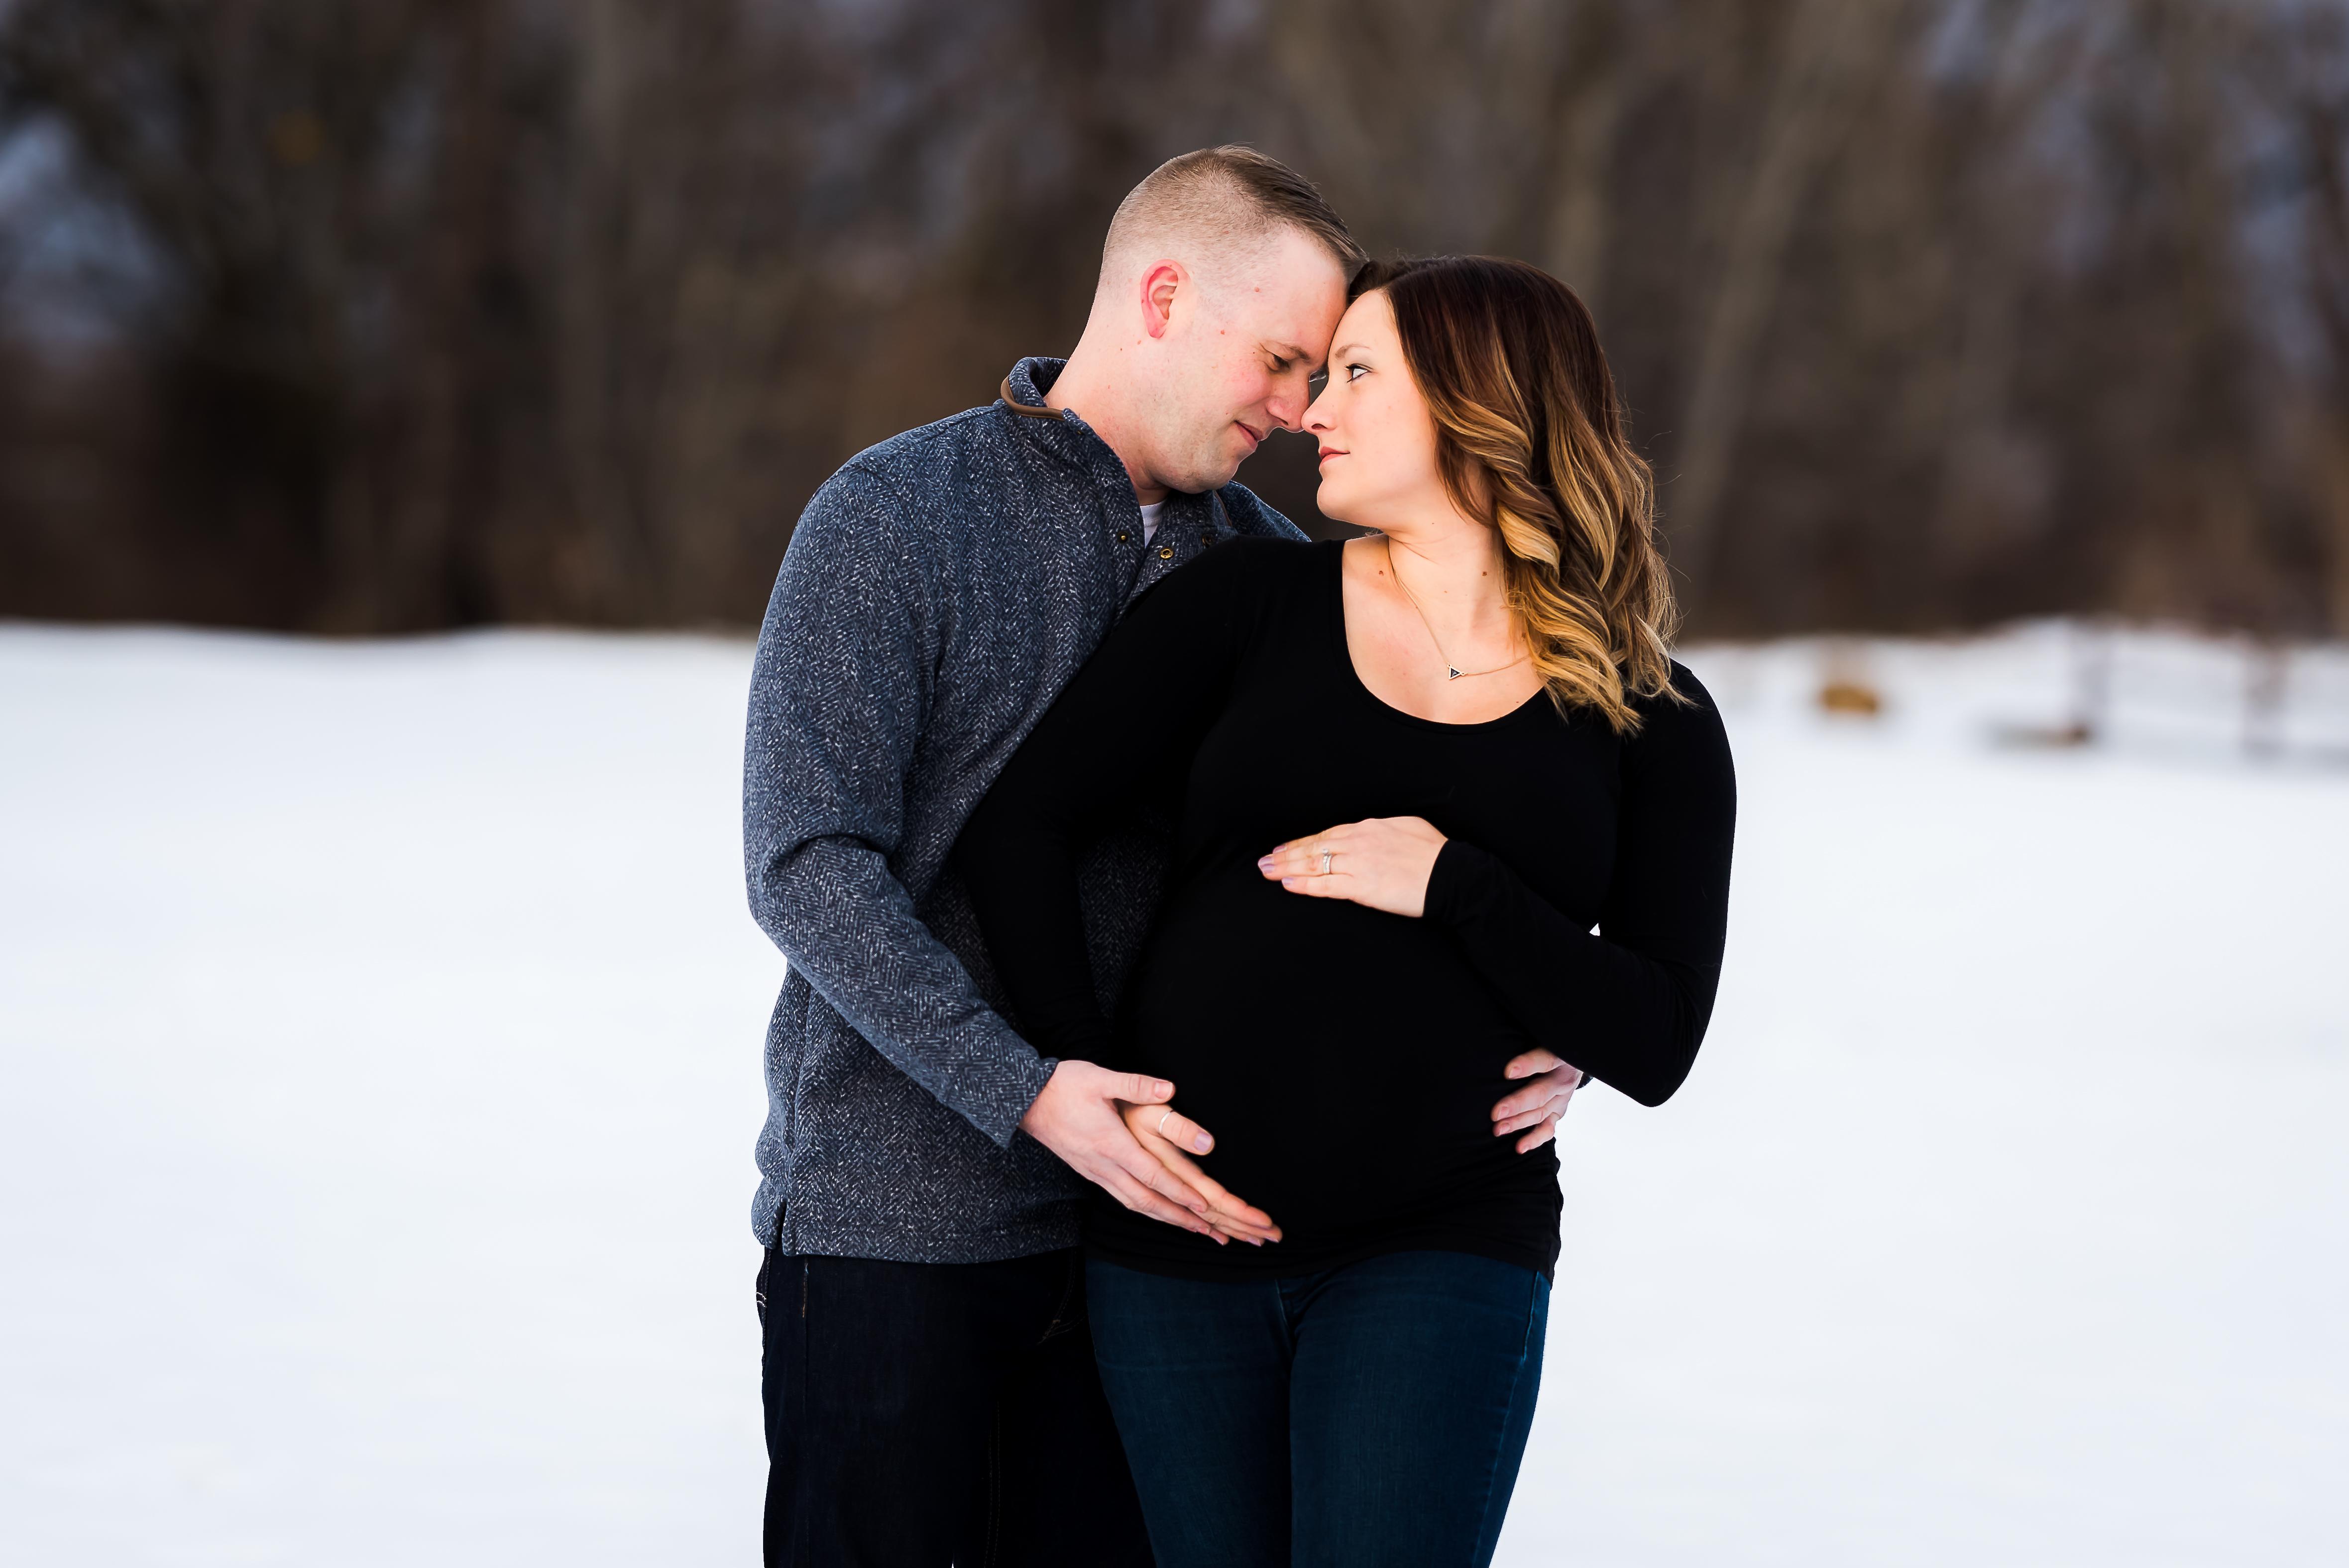 Hudson_Idaho Maternity Photographer-38